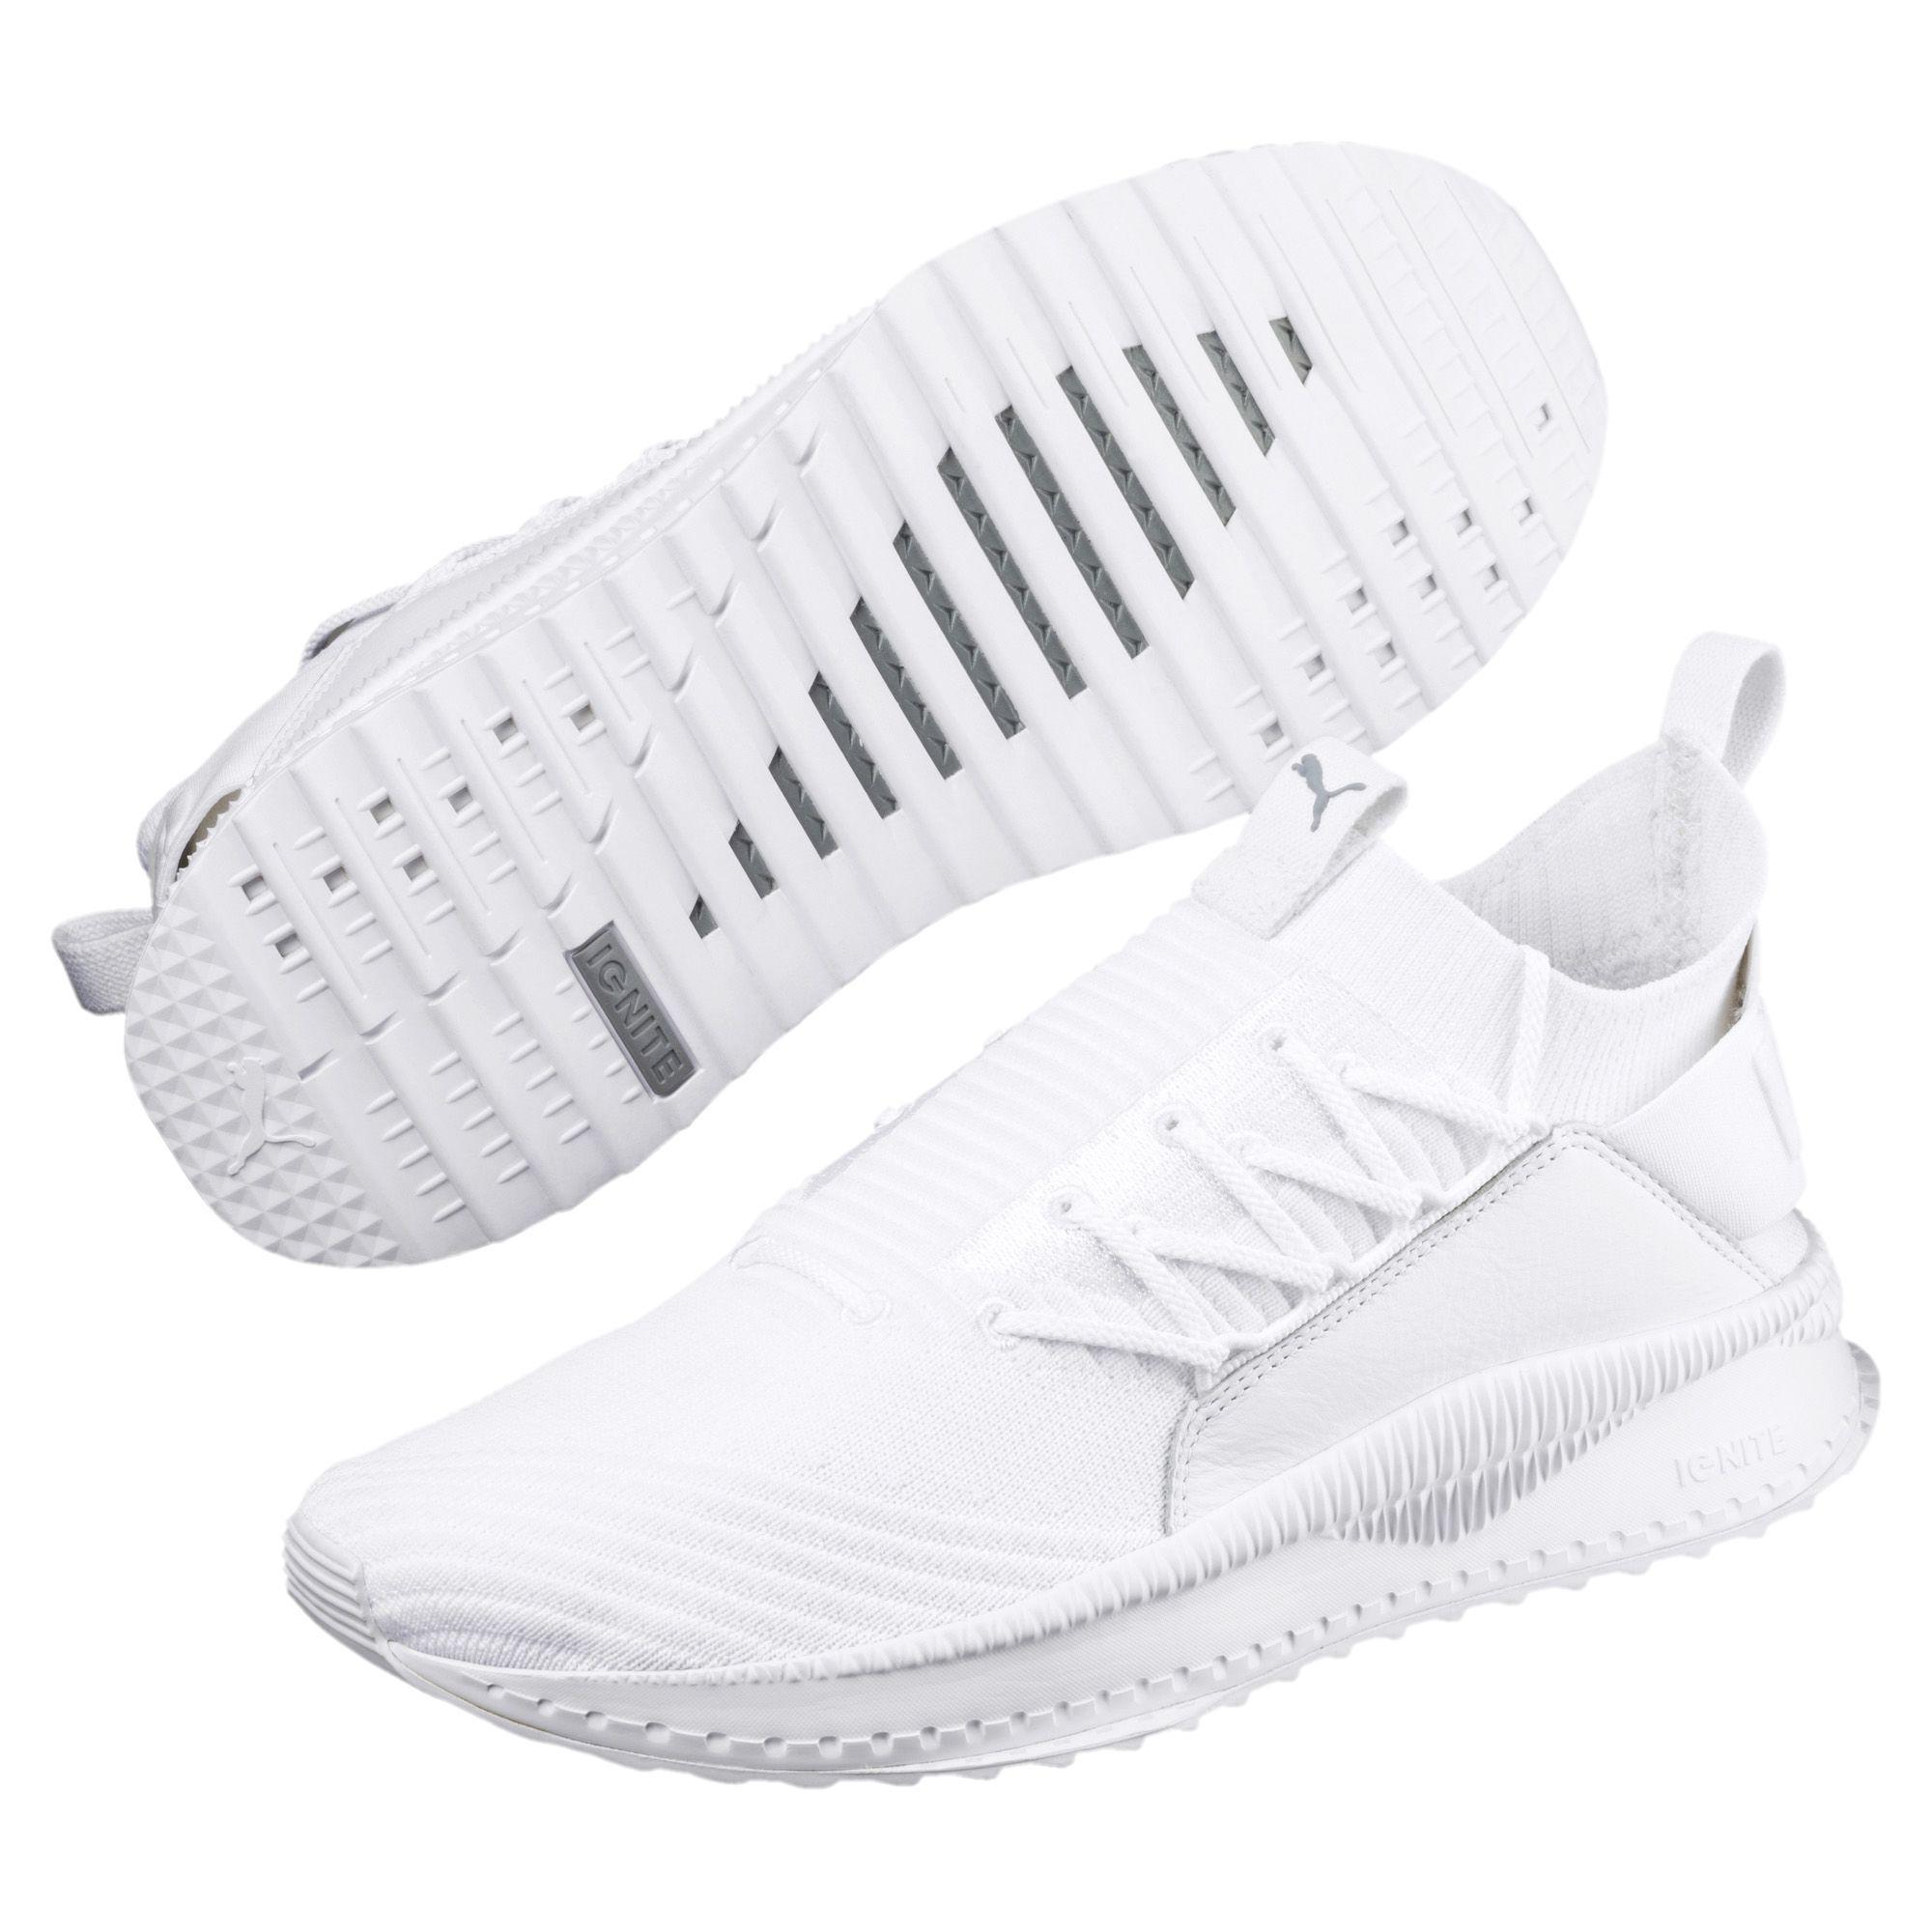 PUMA - White Tsugi Jun Baroque Sneakers - Lyst. View fullscreen 478512b31